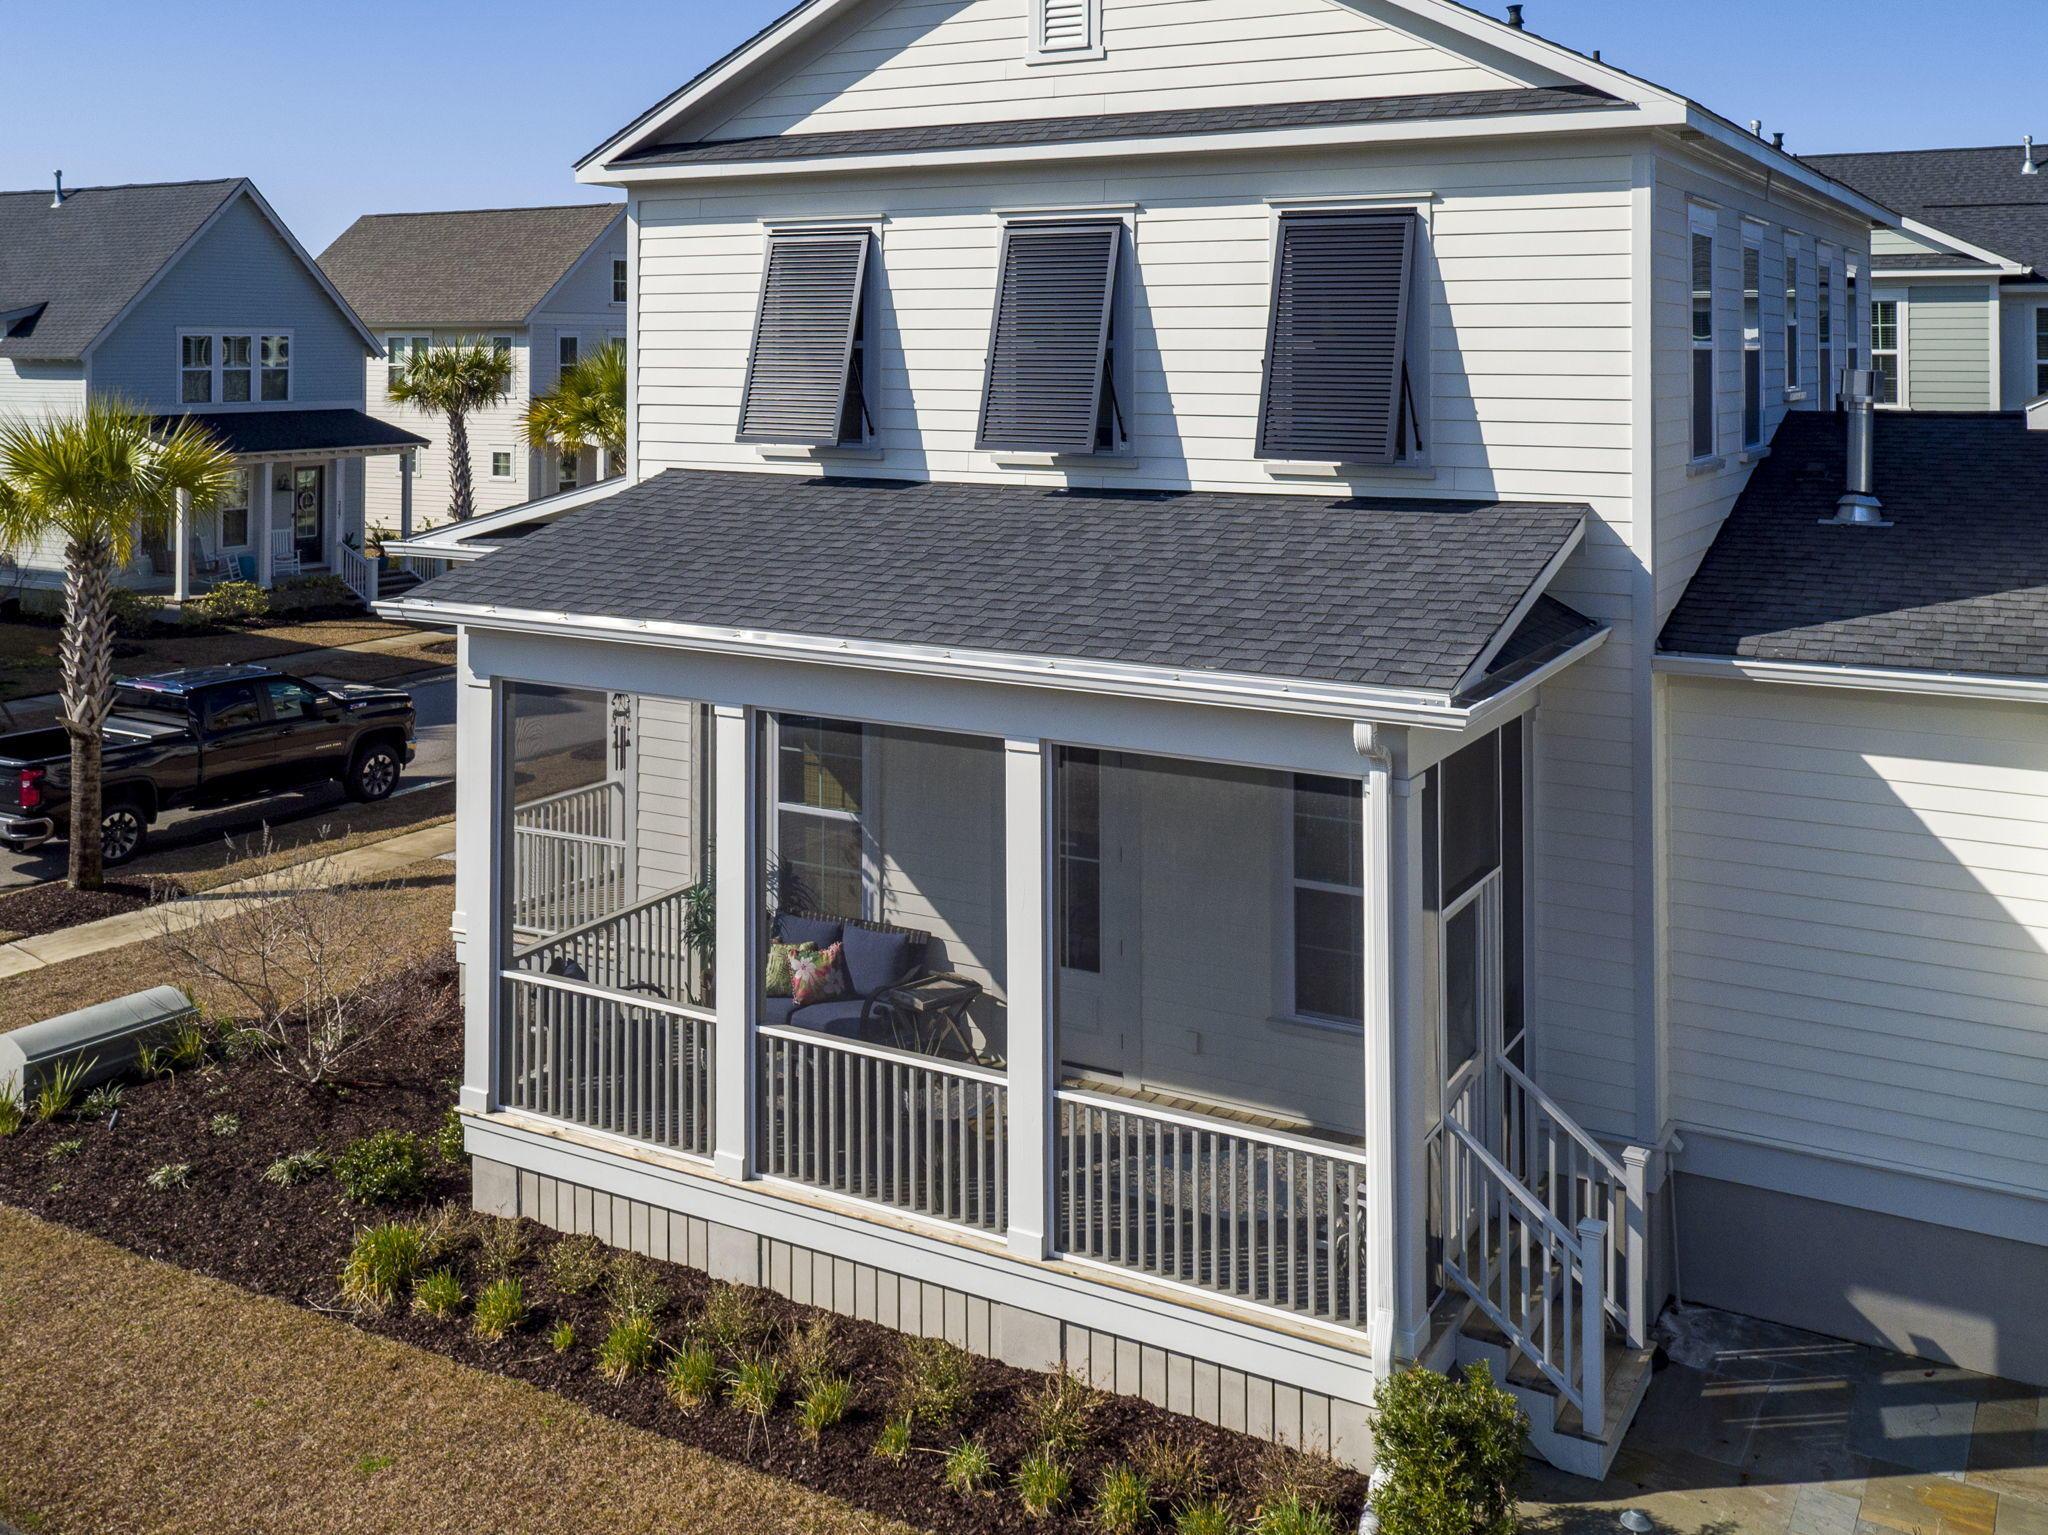 Carolina Park Homes For Sale - 3590 Backshore, Mount Pleasant, SC - 64